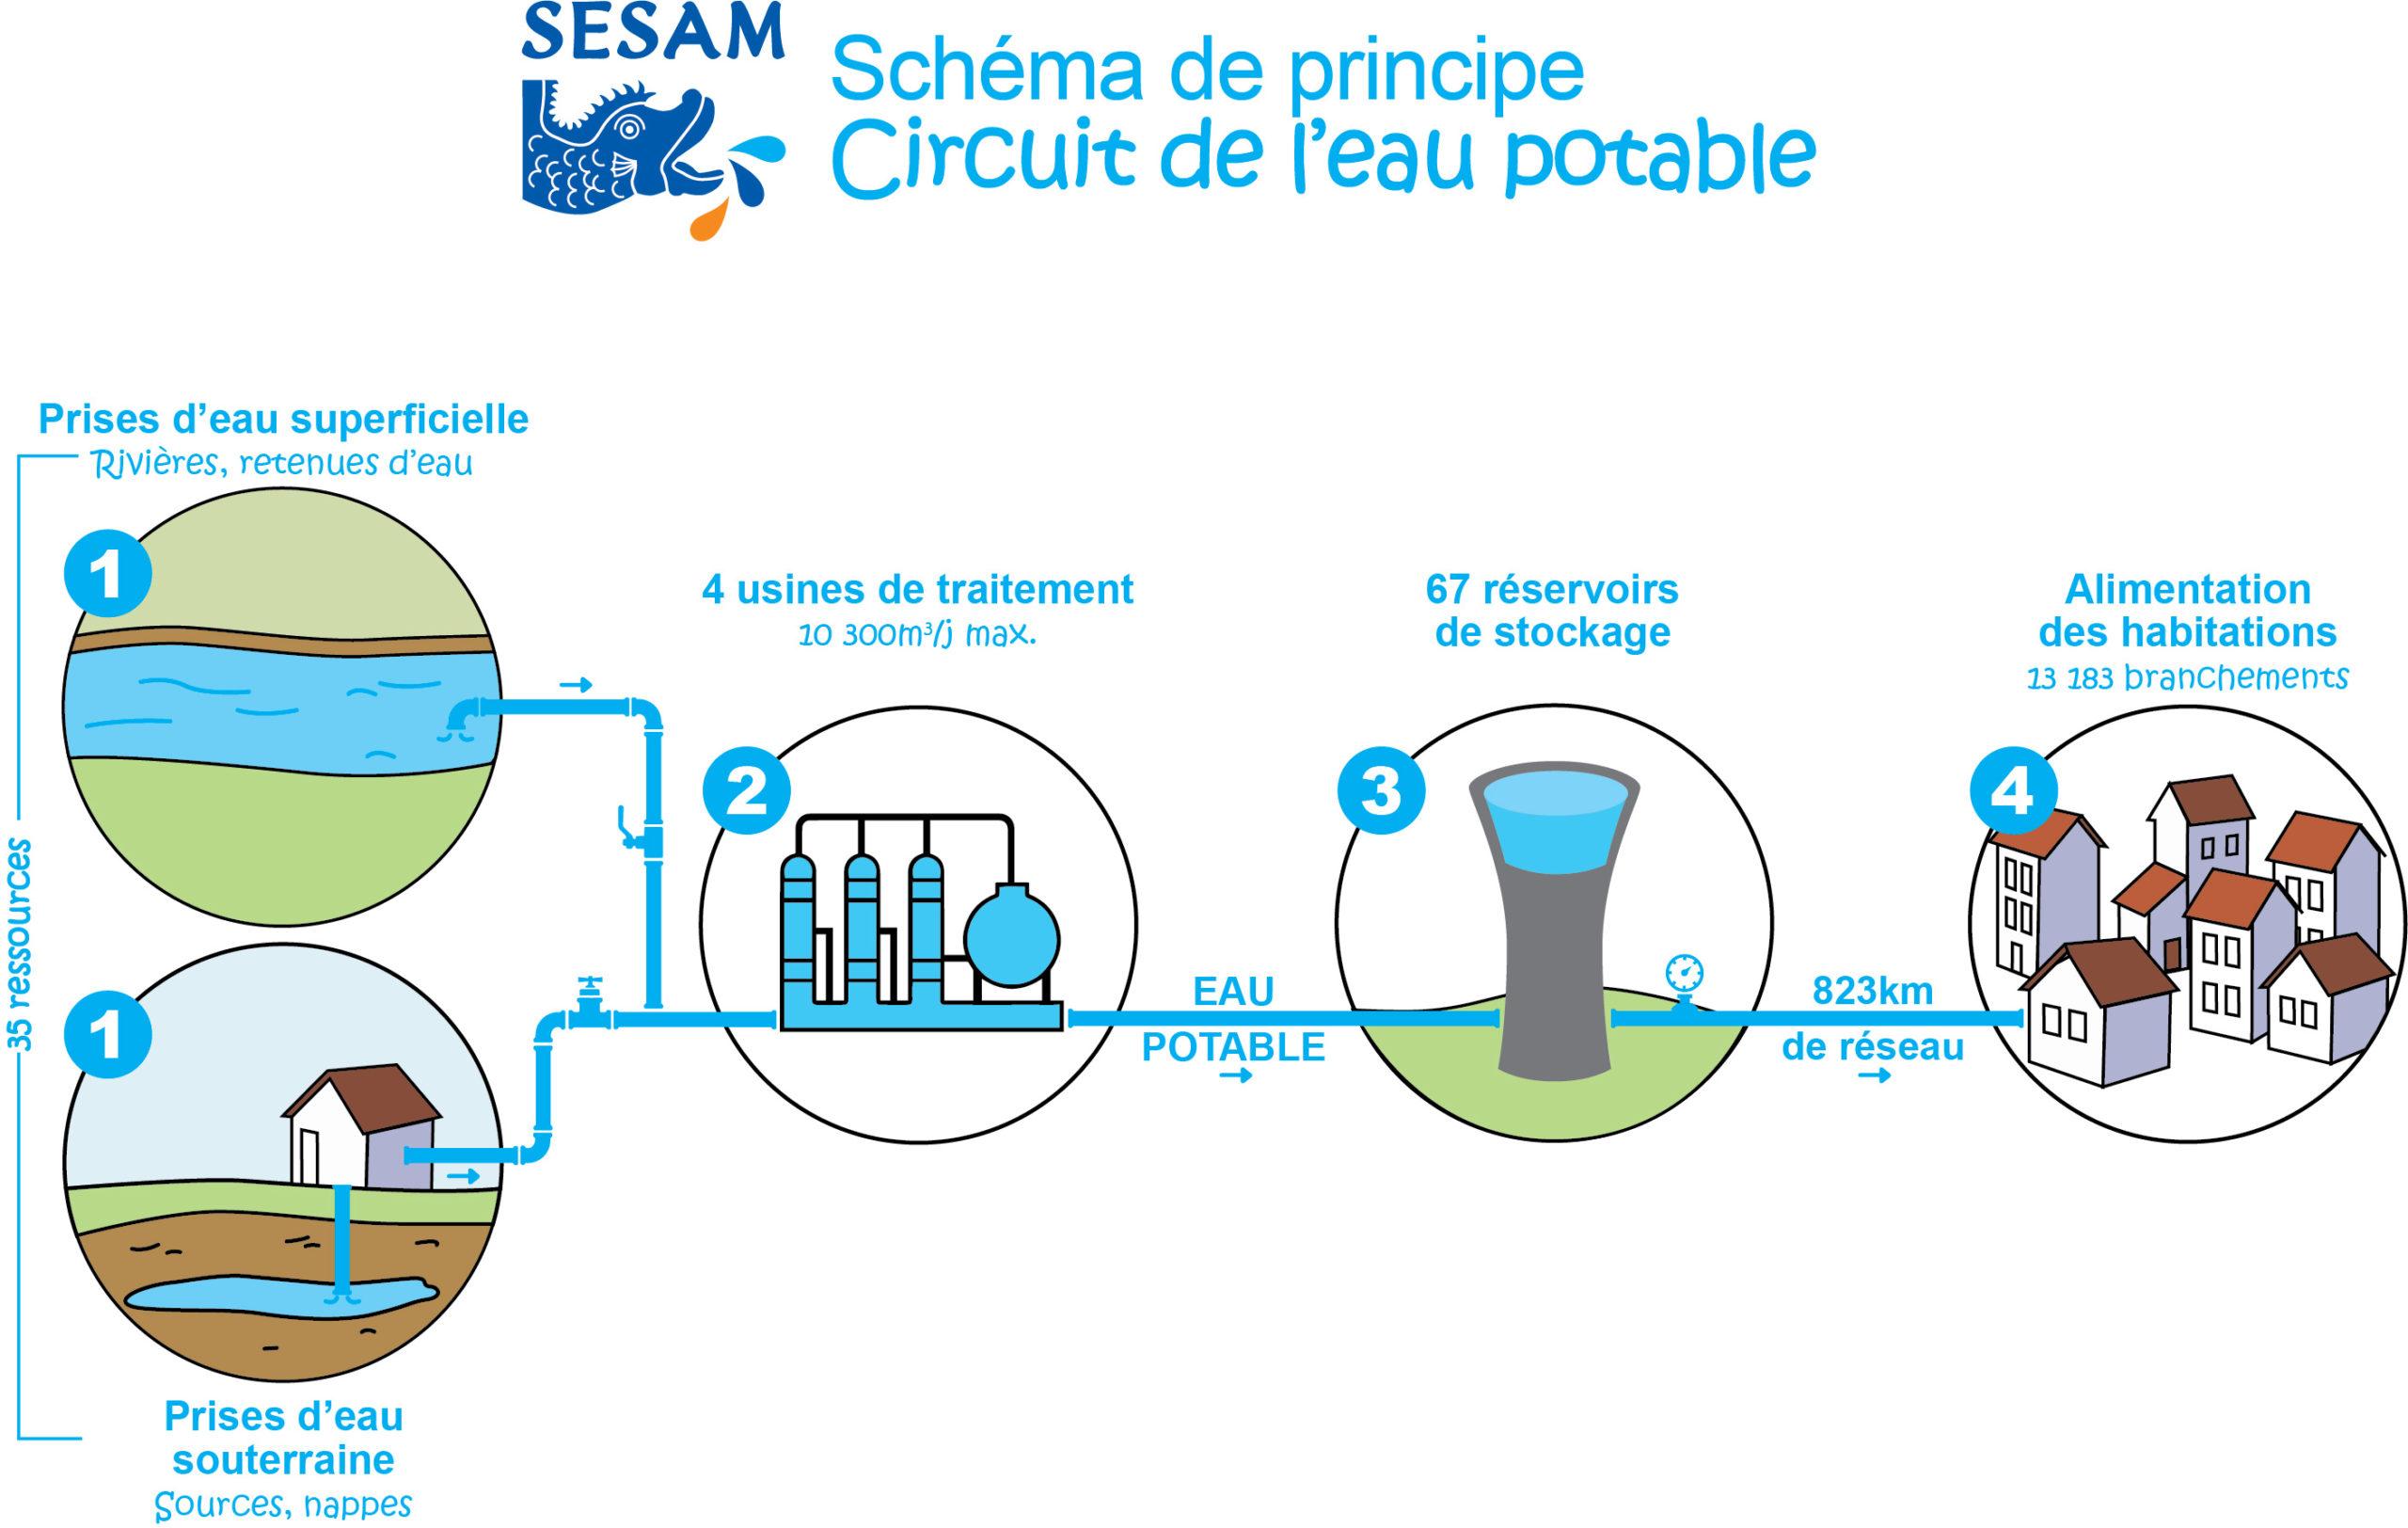 Circuit AEP SESAM